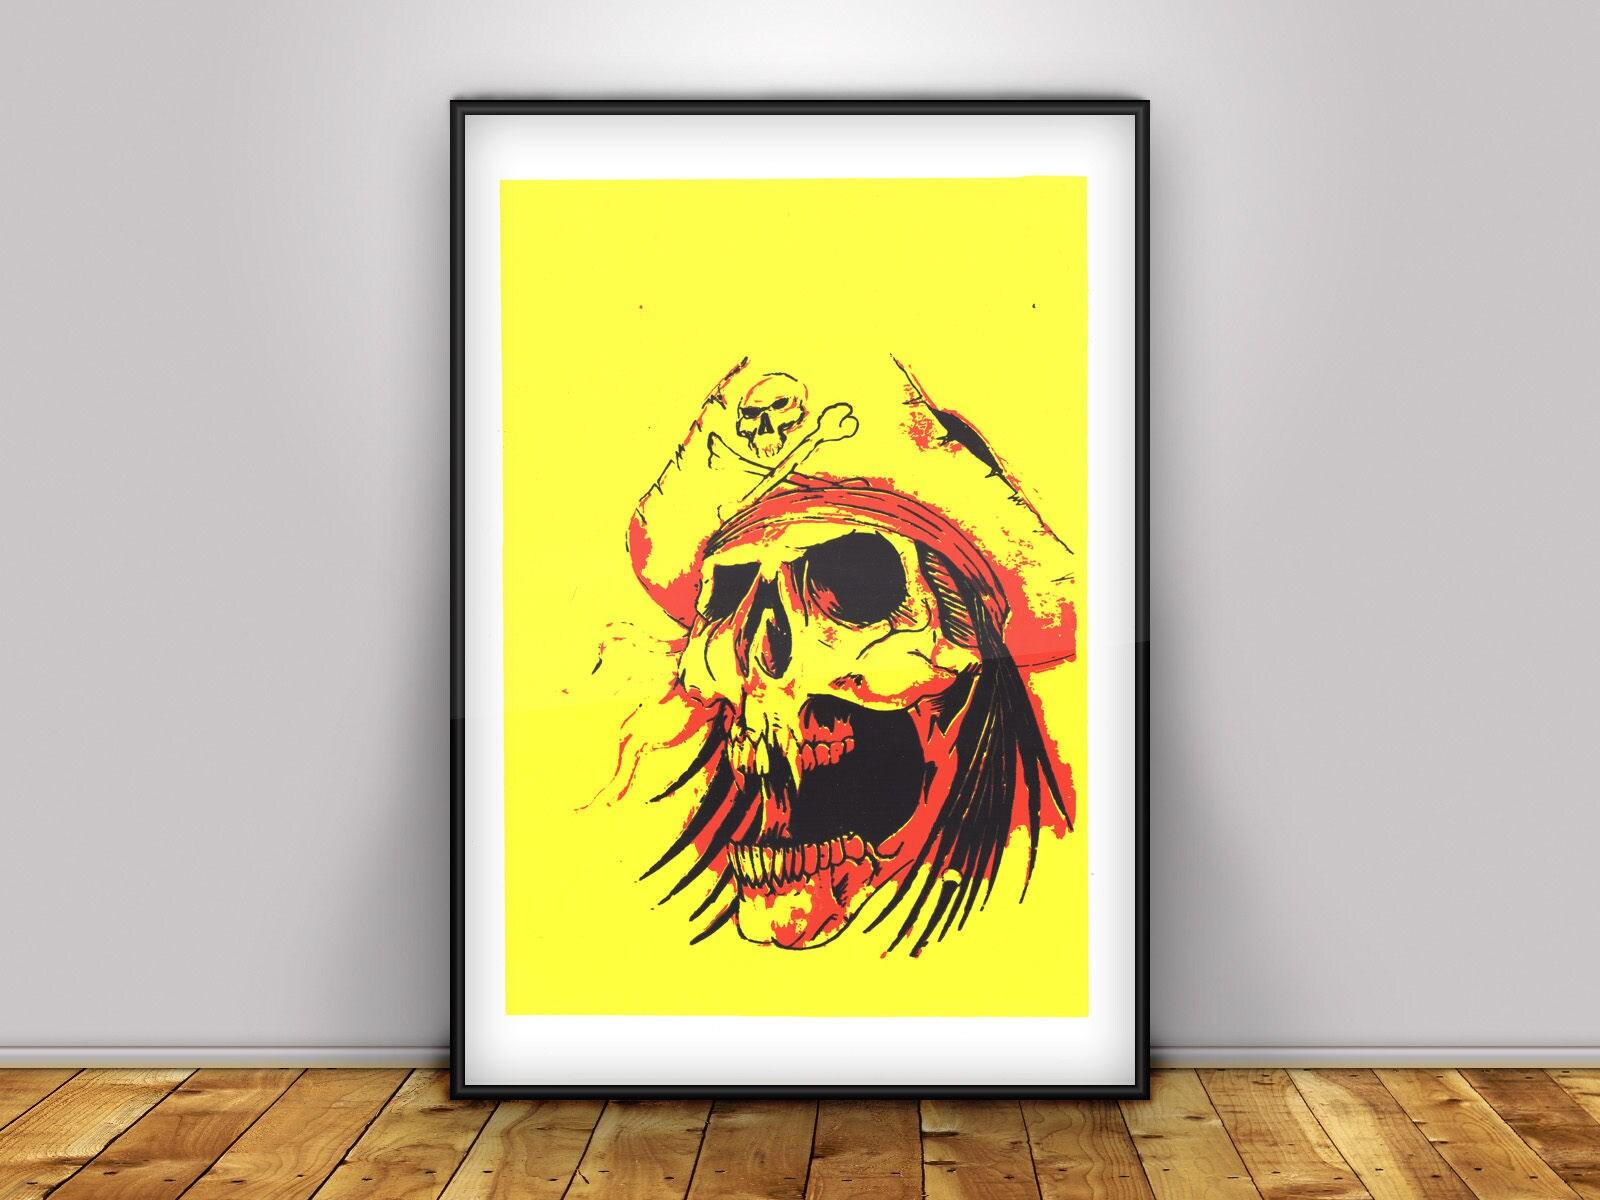 Pirate Digital Print Home Decor Wall Art Poster